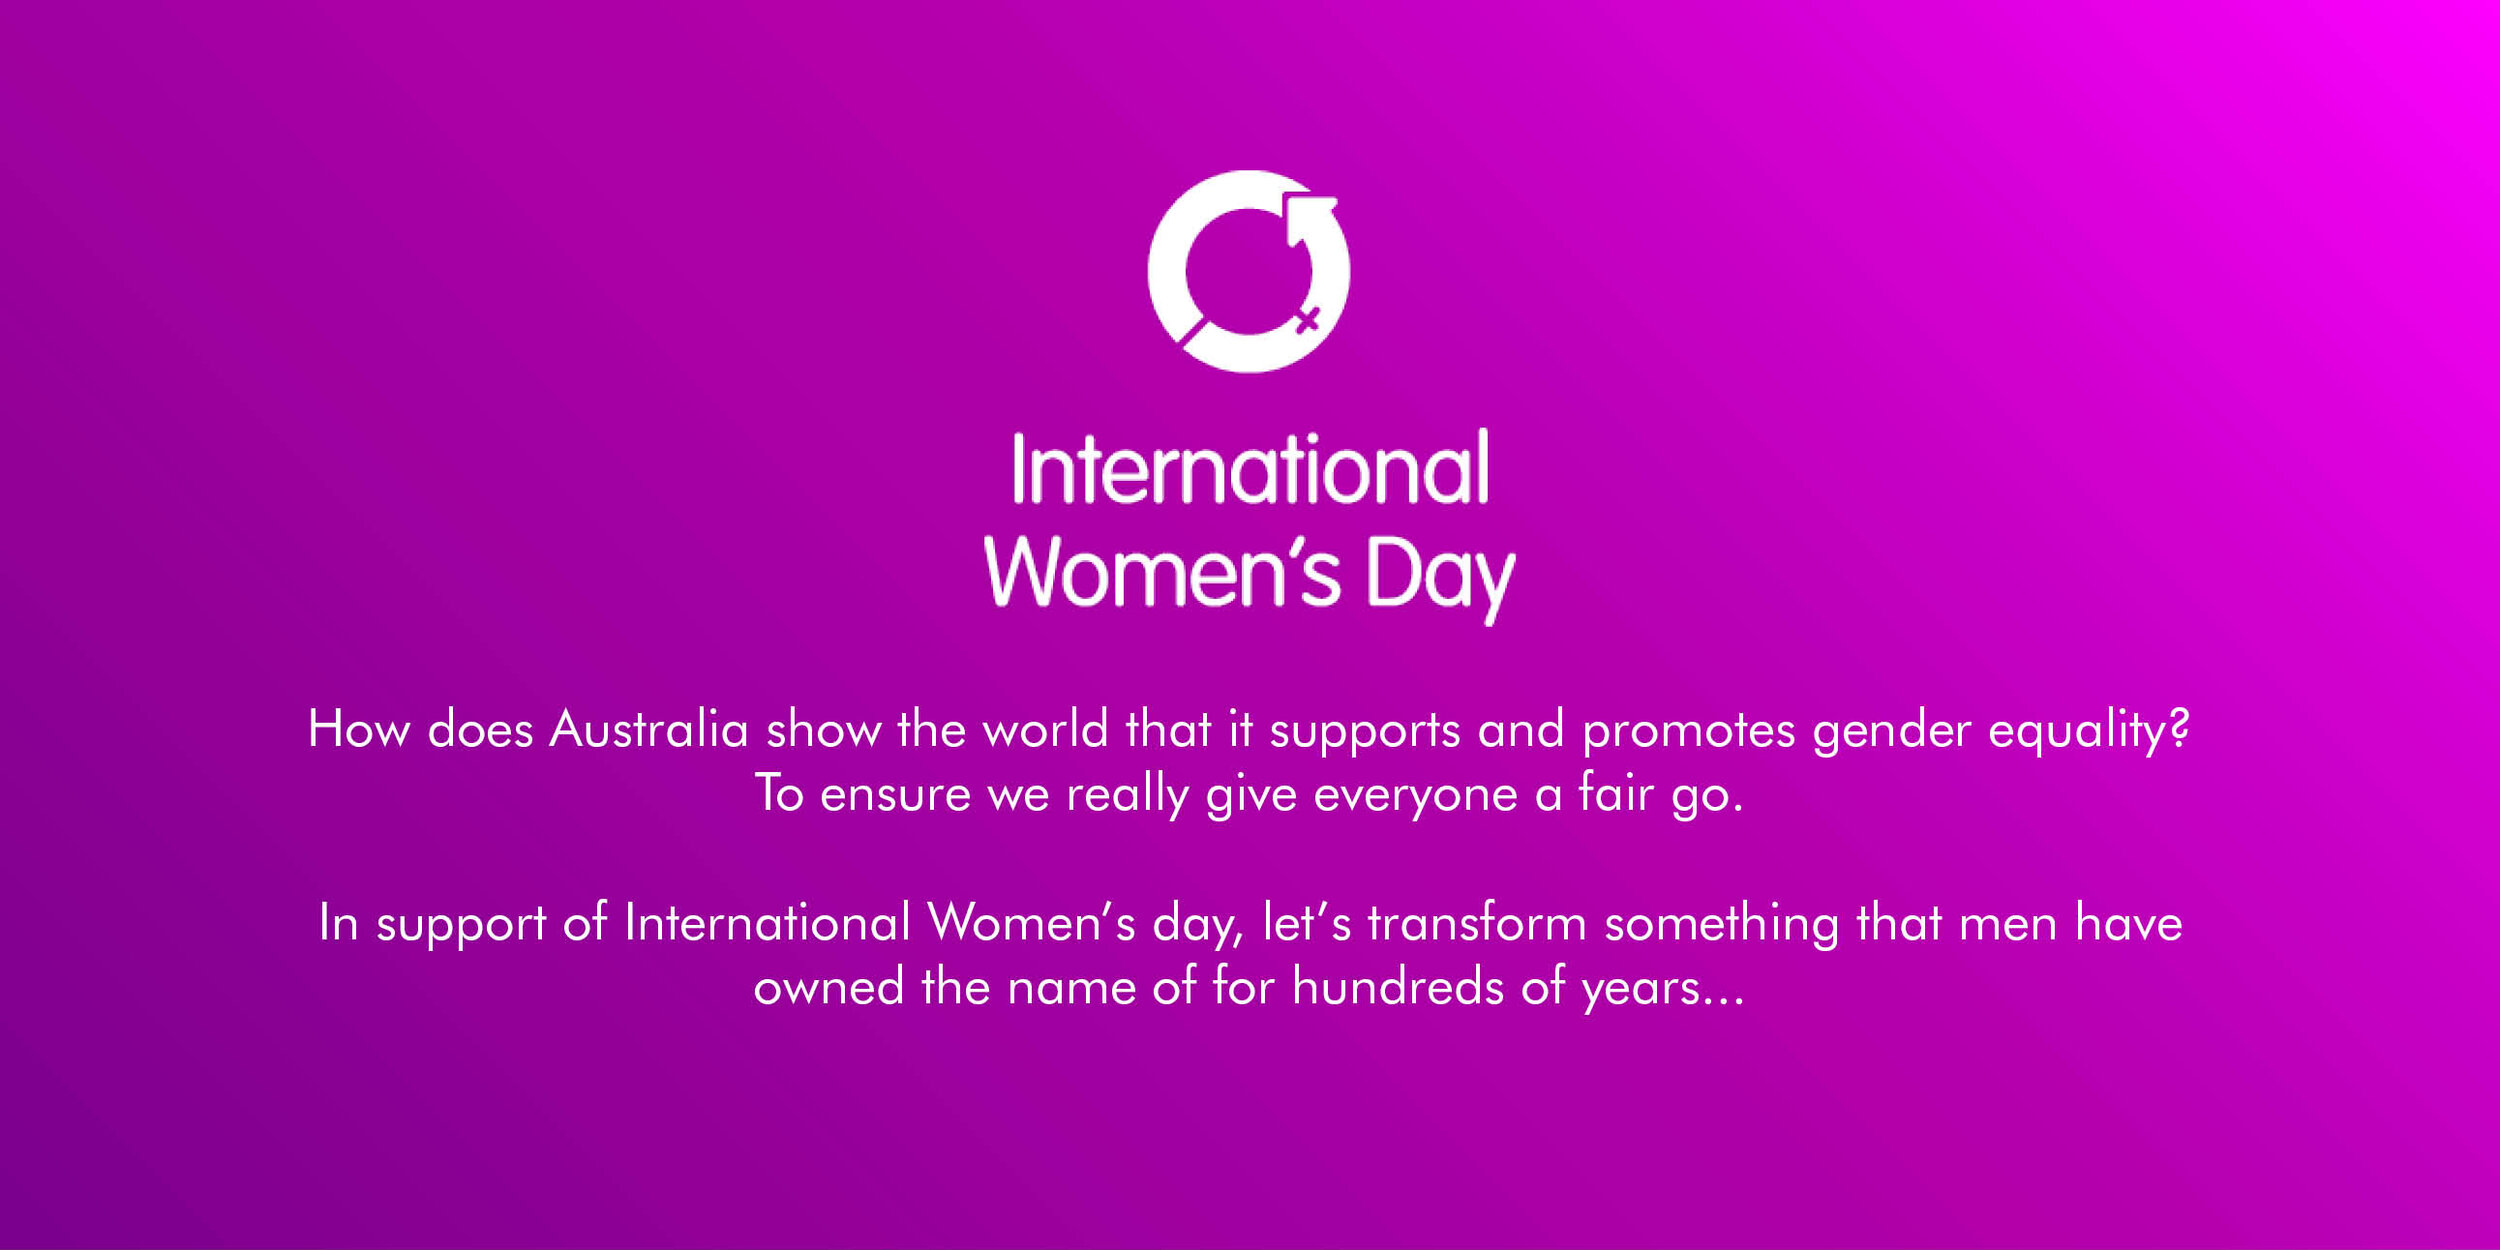 IntWomensDay.jpg